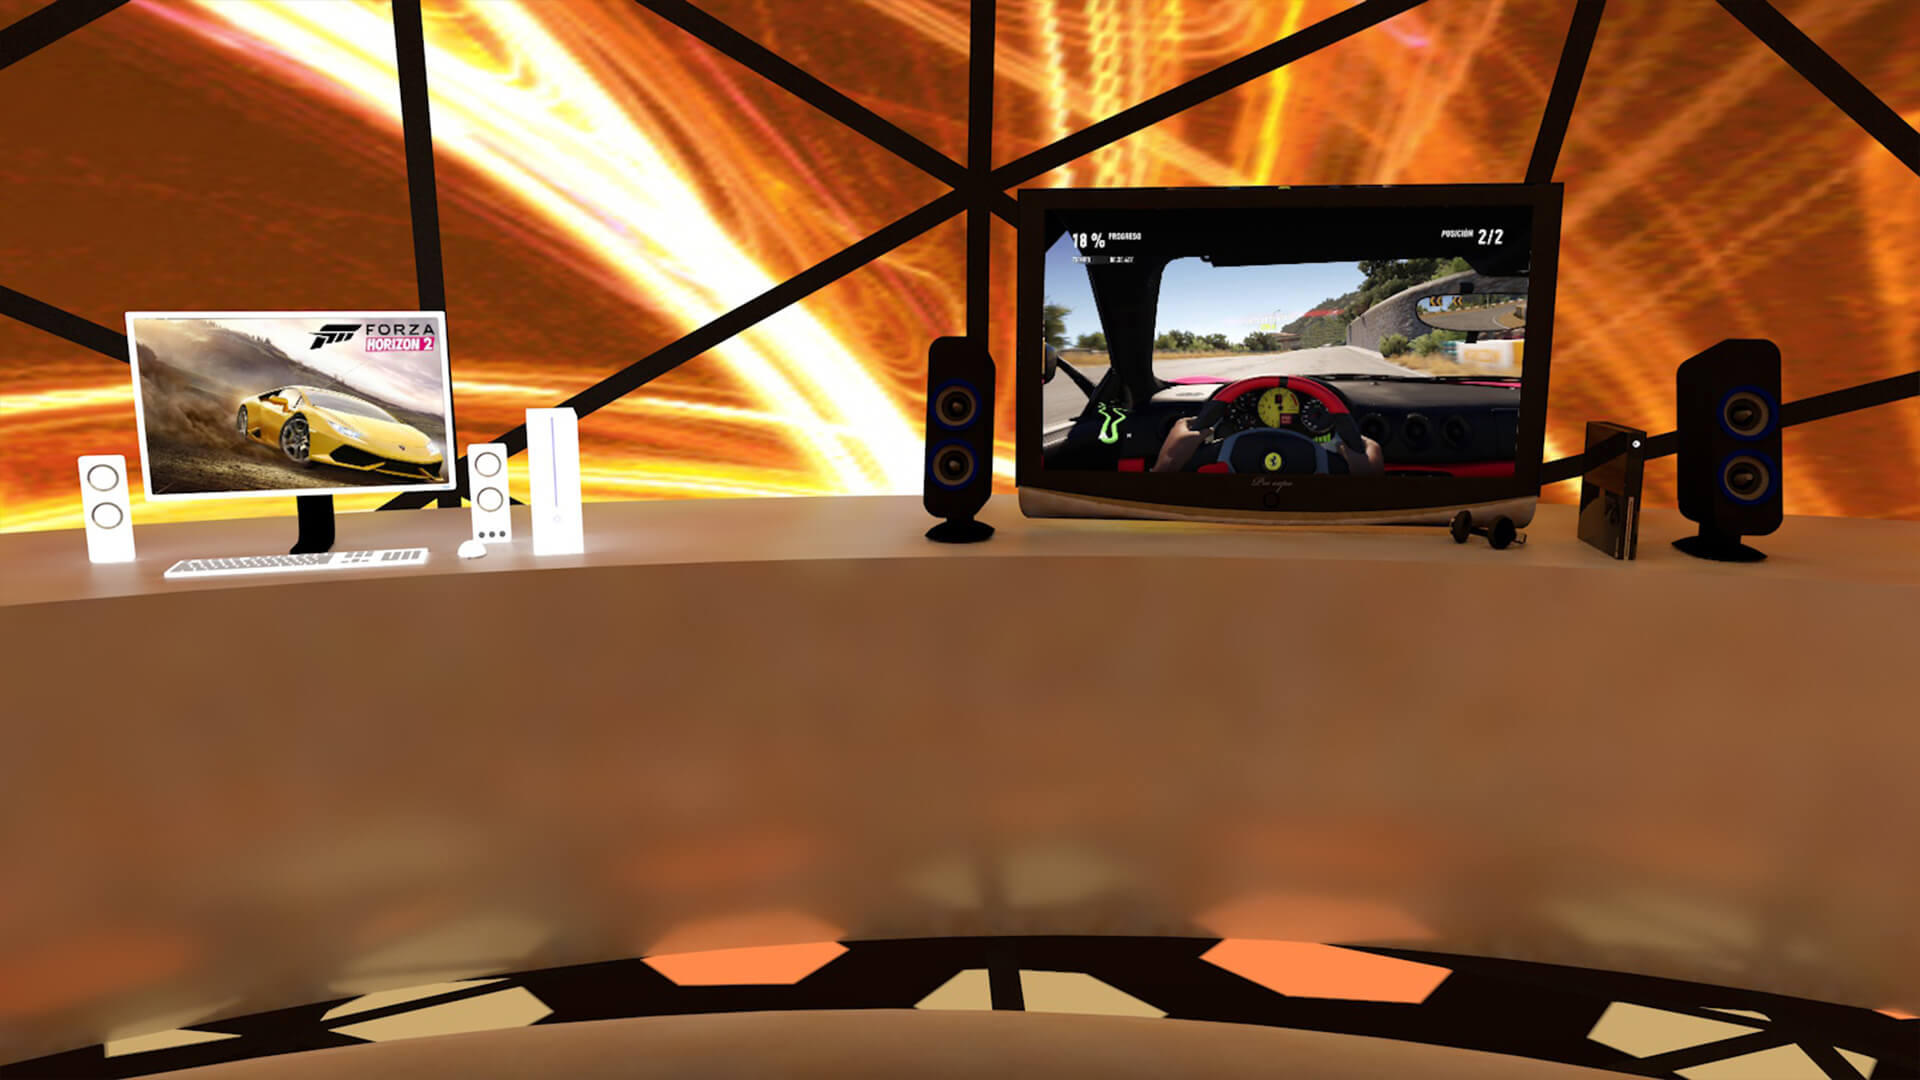 Microsoft Software Release App 3D concept